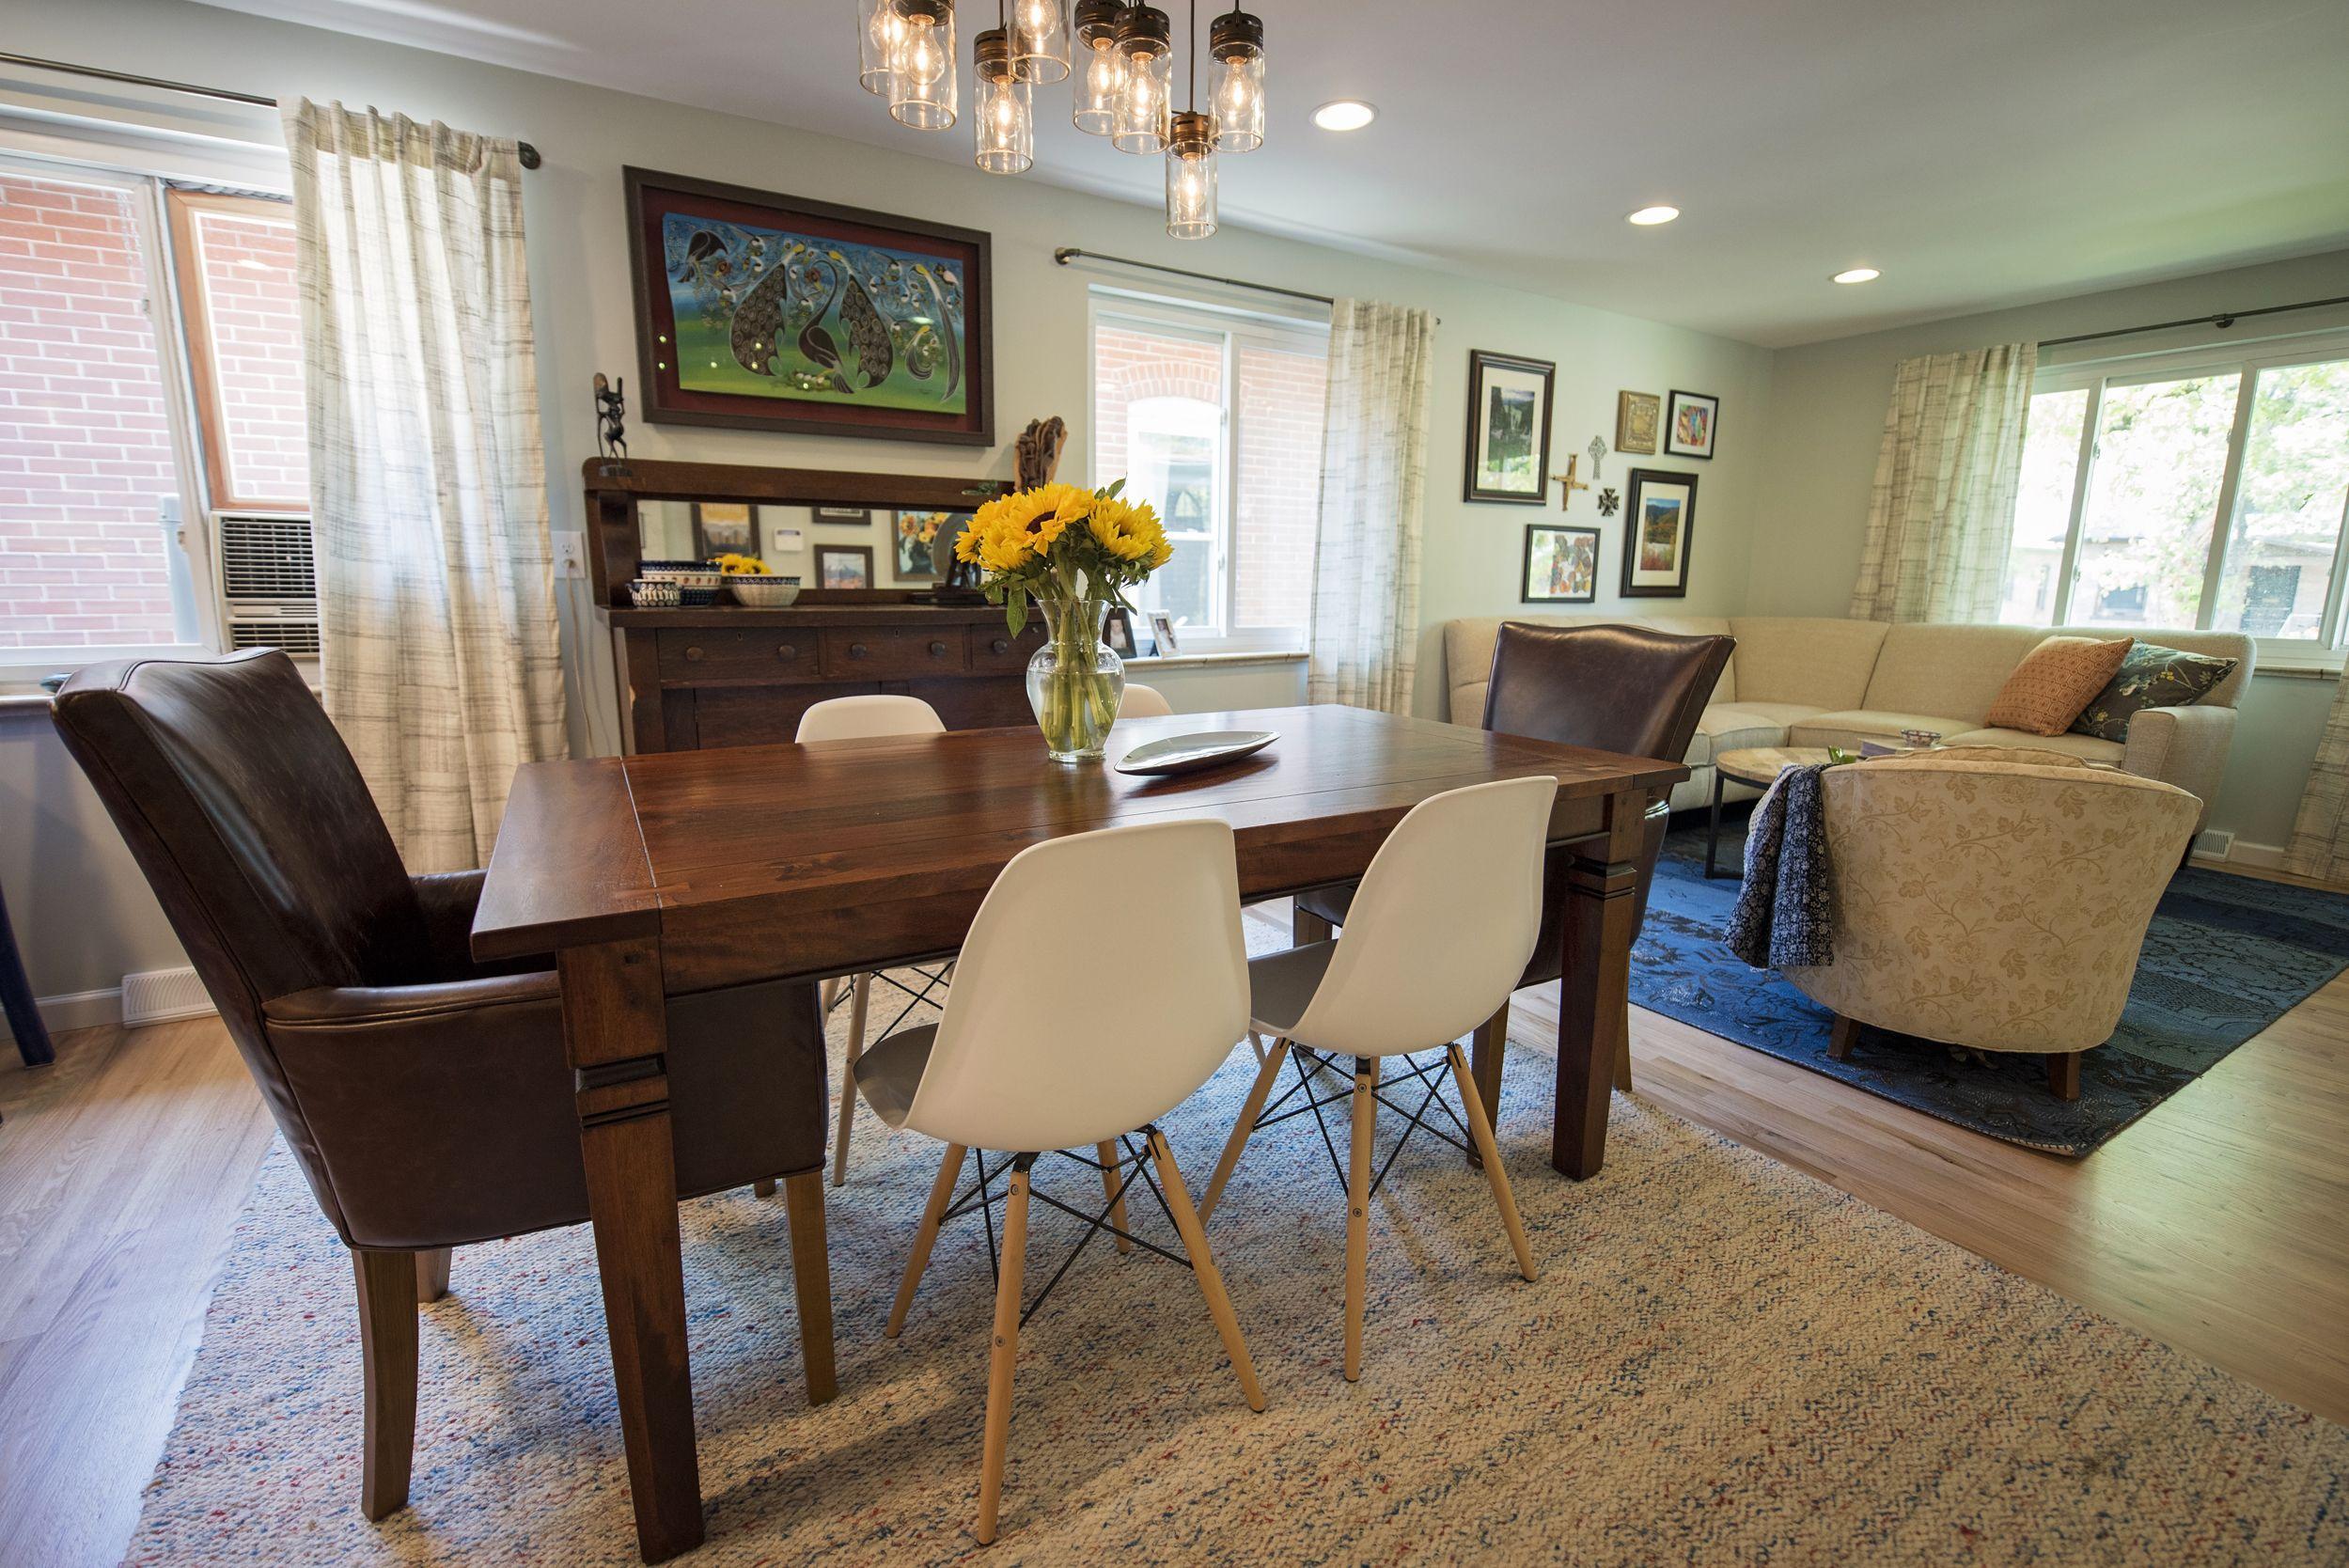 interior home designer planning design new with designers fresh denver fair concept redesign co of for creative